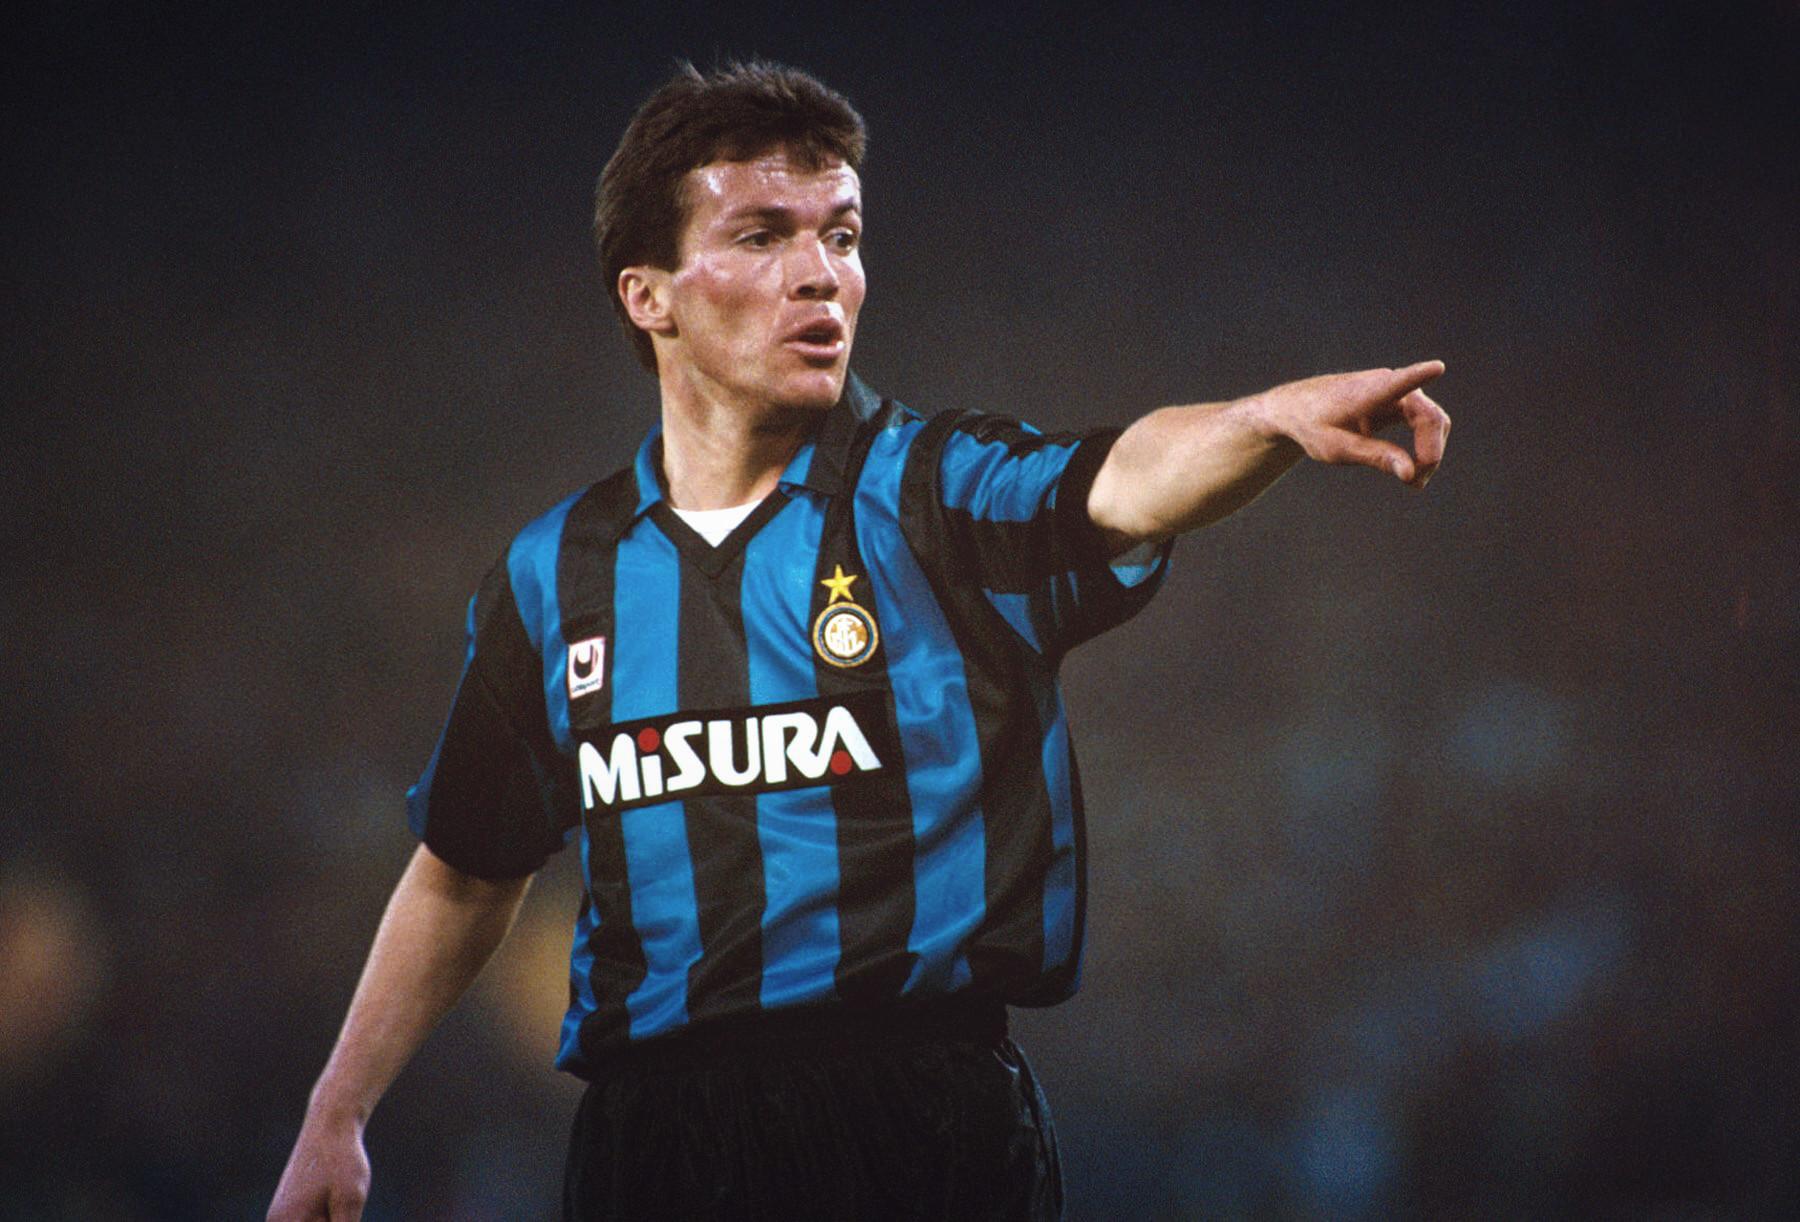 When Lothar Matthäus went to Inter Milan and became a legend